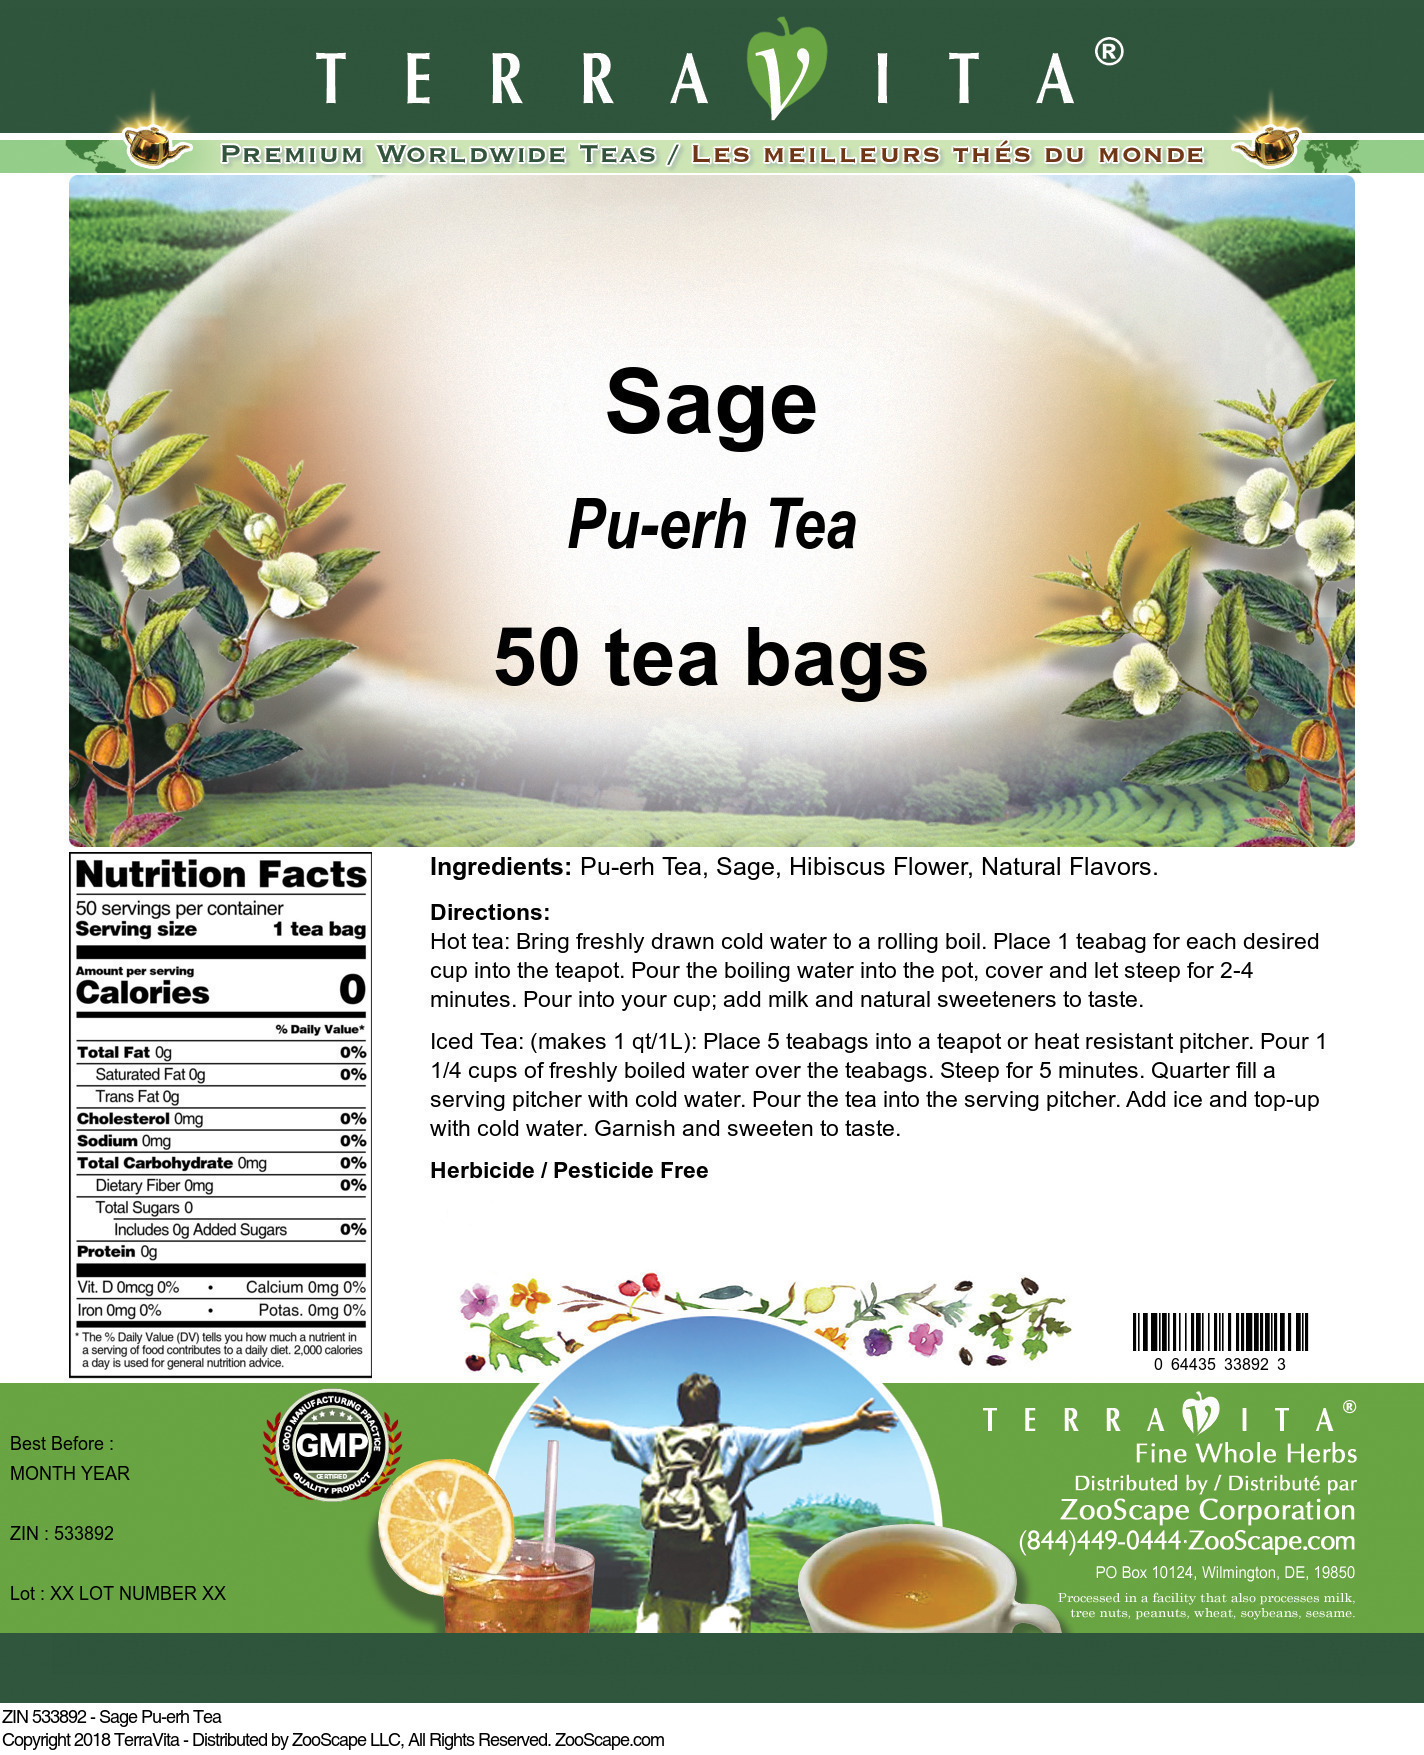 Sage Pu-erh Tea